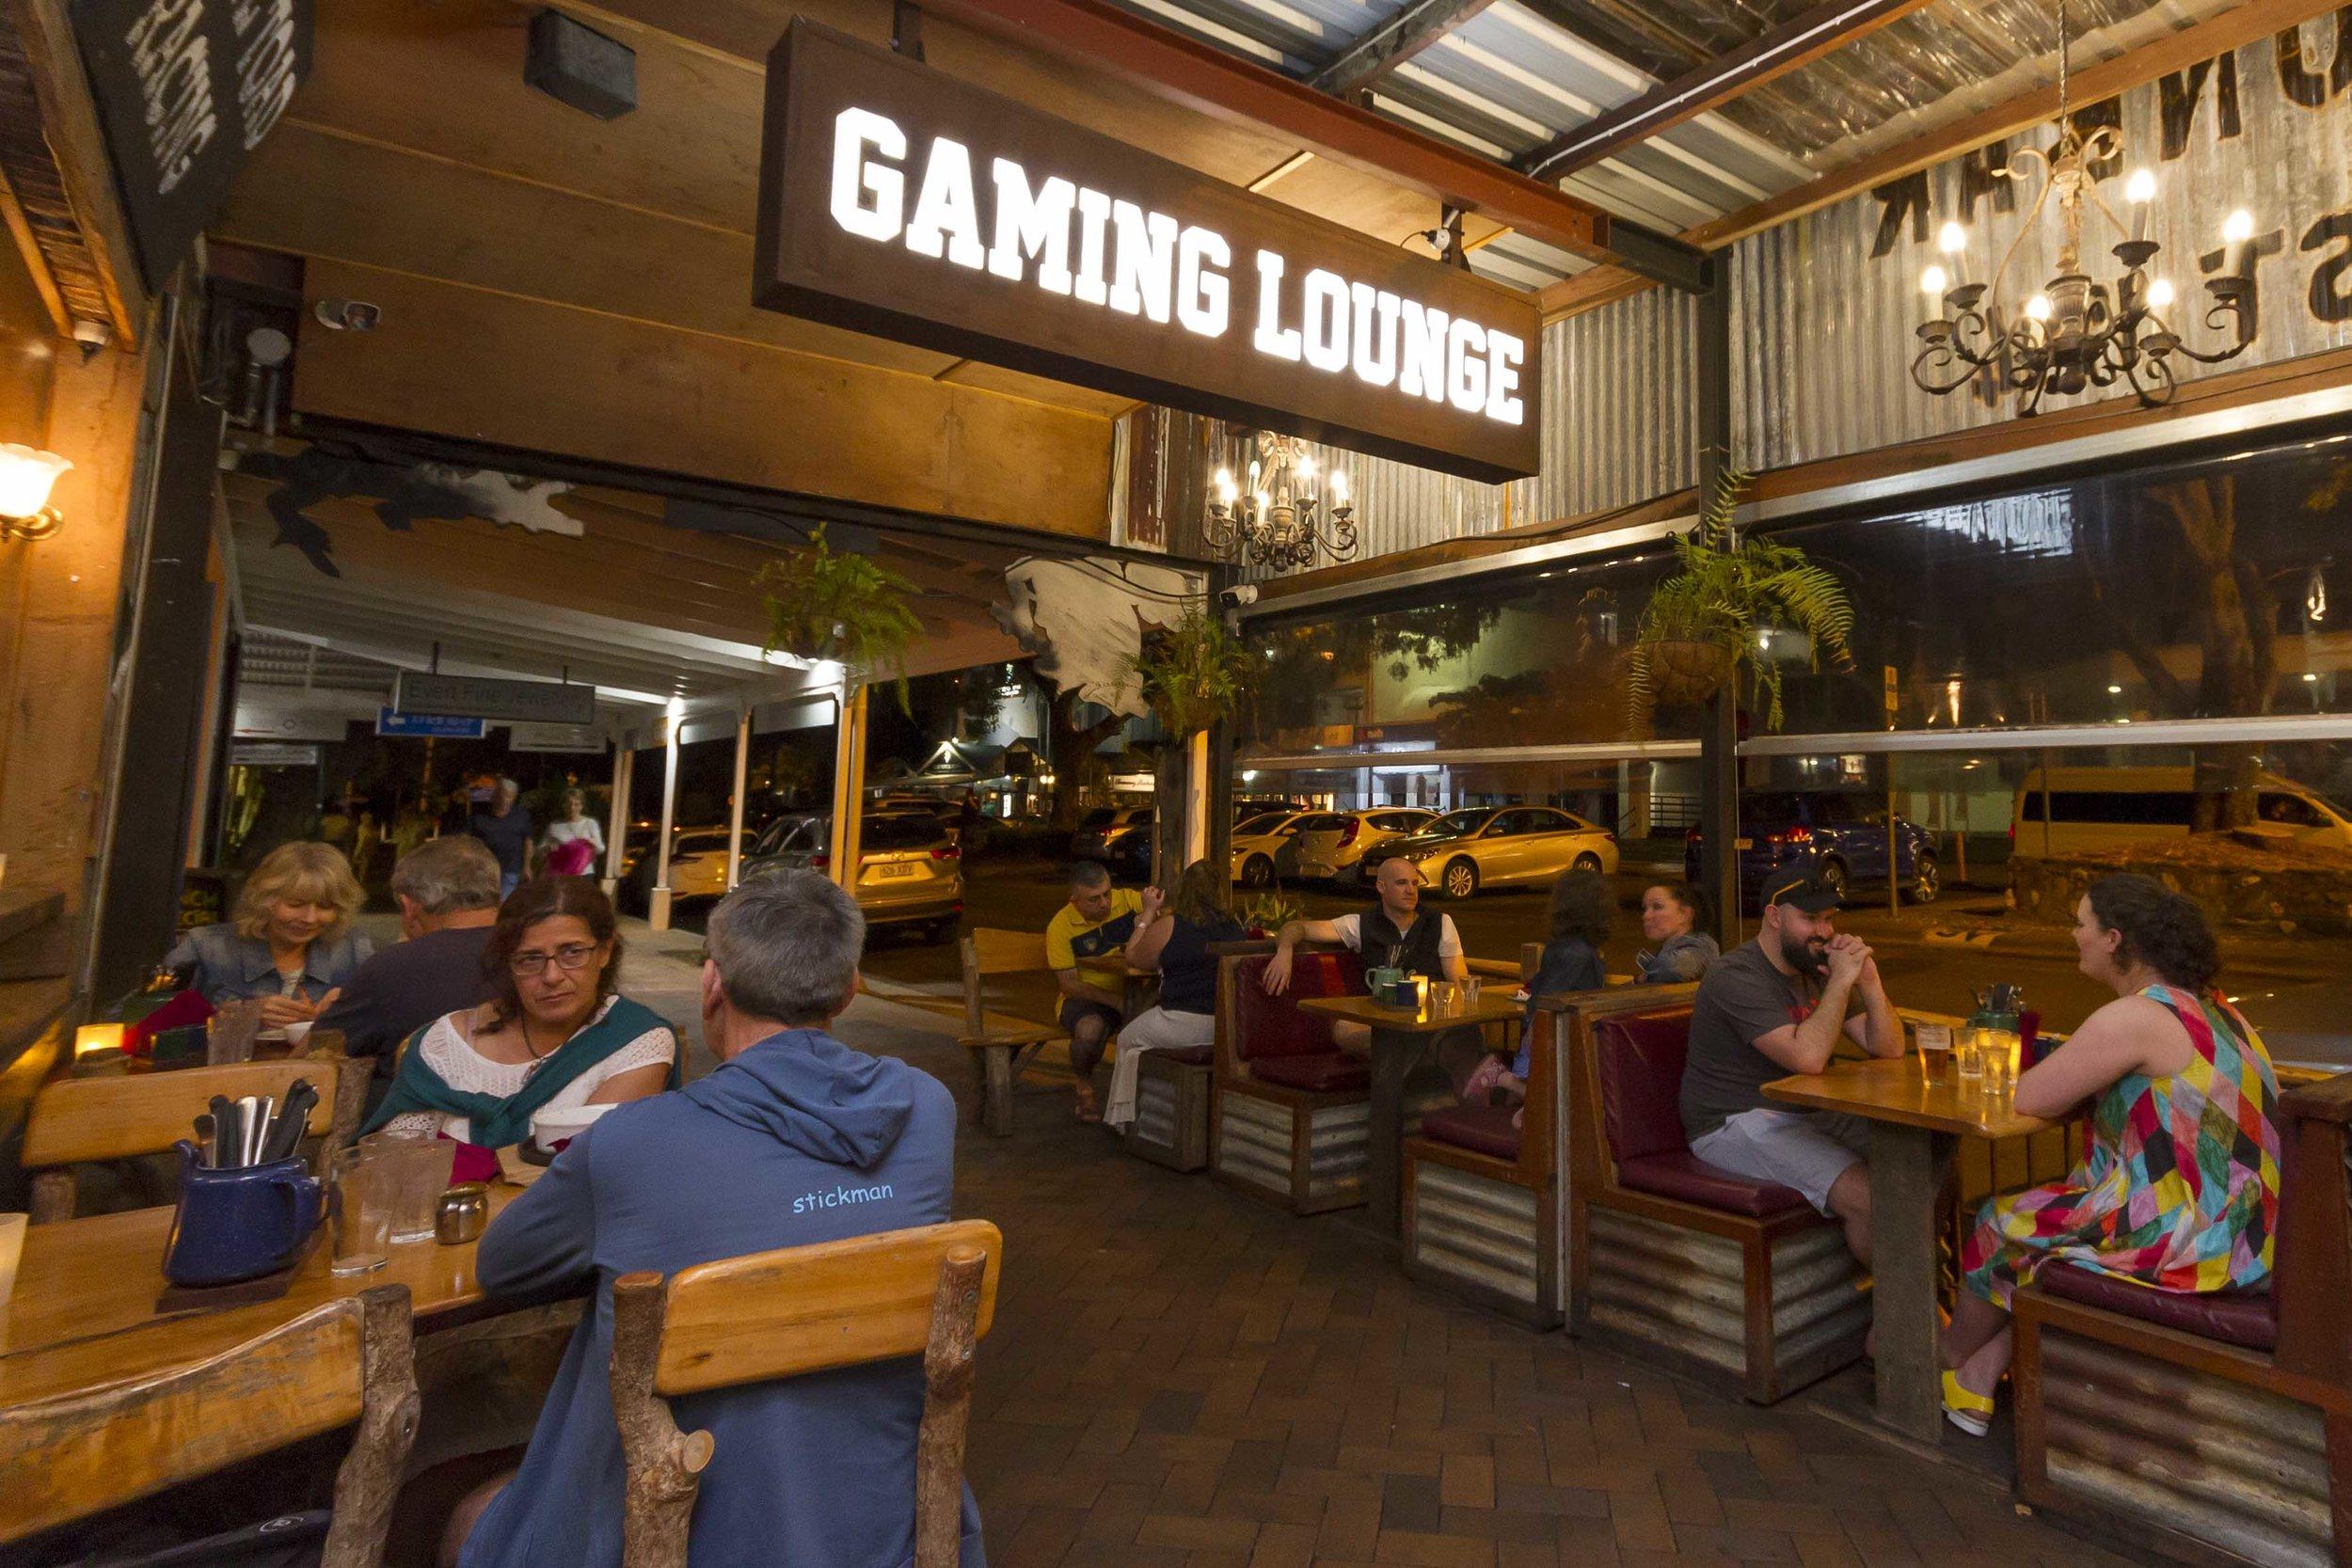 Ironbar_Gaming Lounge_Website Quality (17).jpg